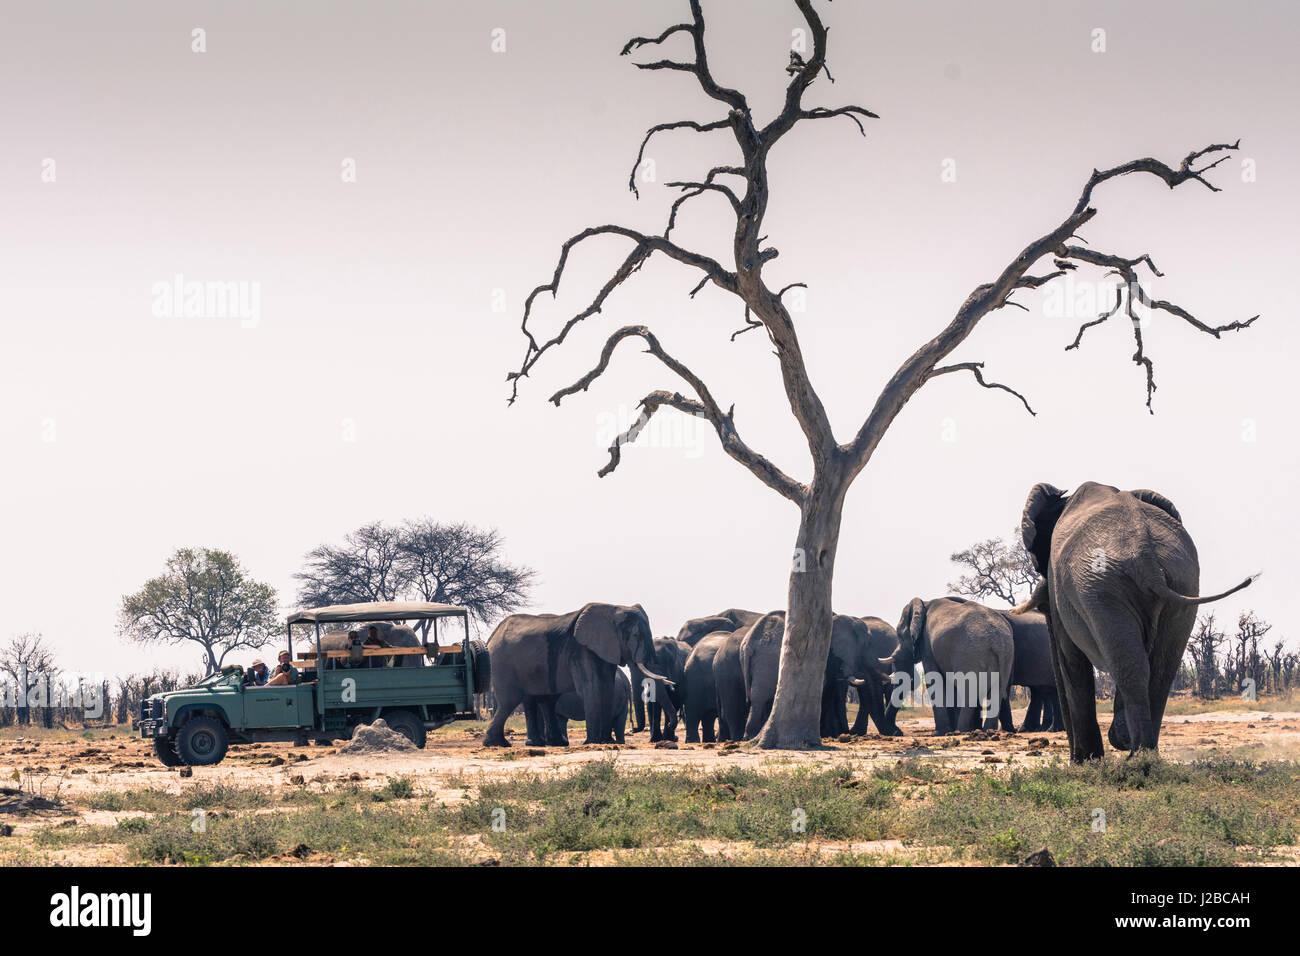 Botswana. Chobe National Park. Savuti. Safari-Fahrzeug und eine Herde Elefanten. Stockbild